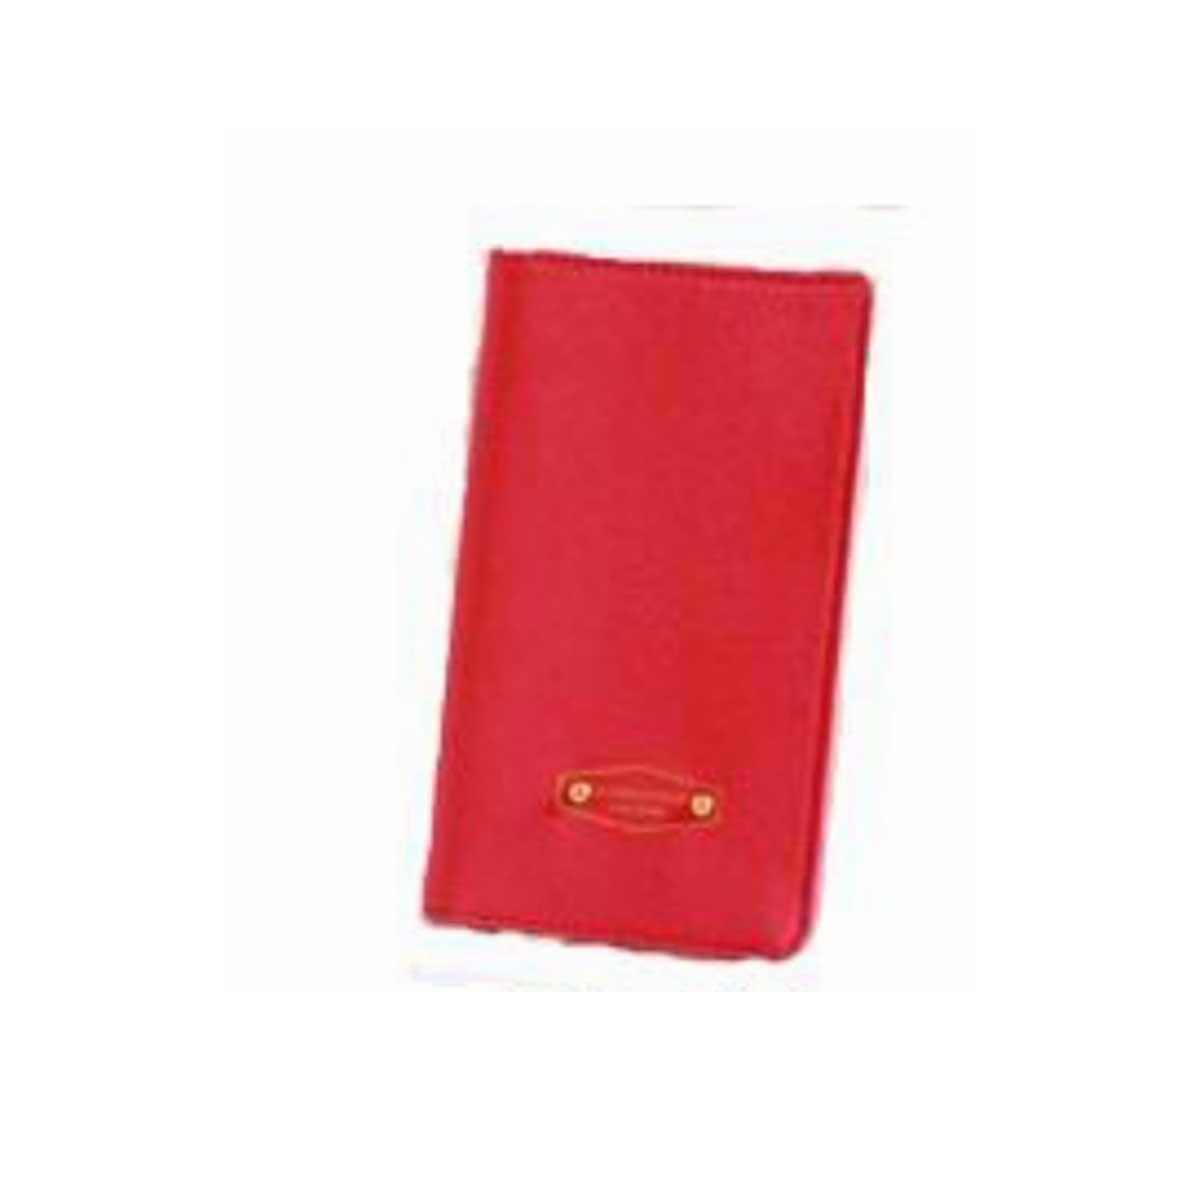 Korean leather travel passport wallet (Red)